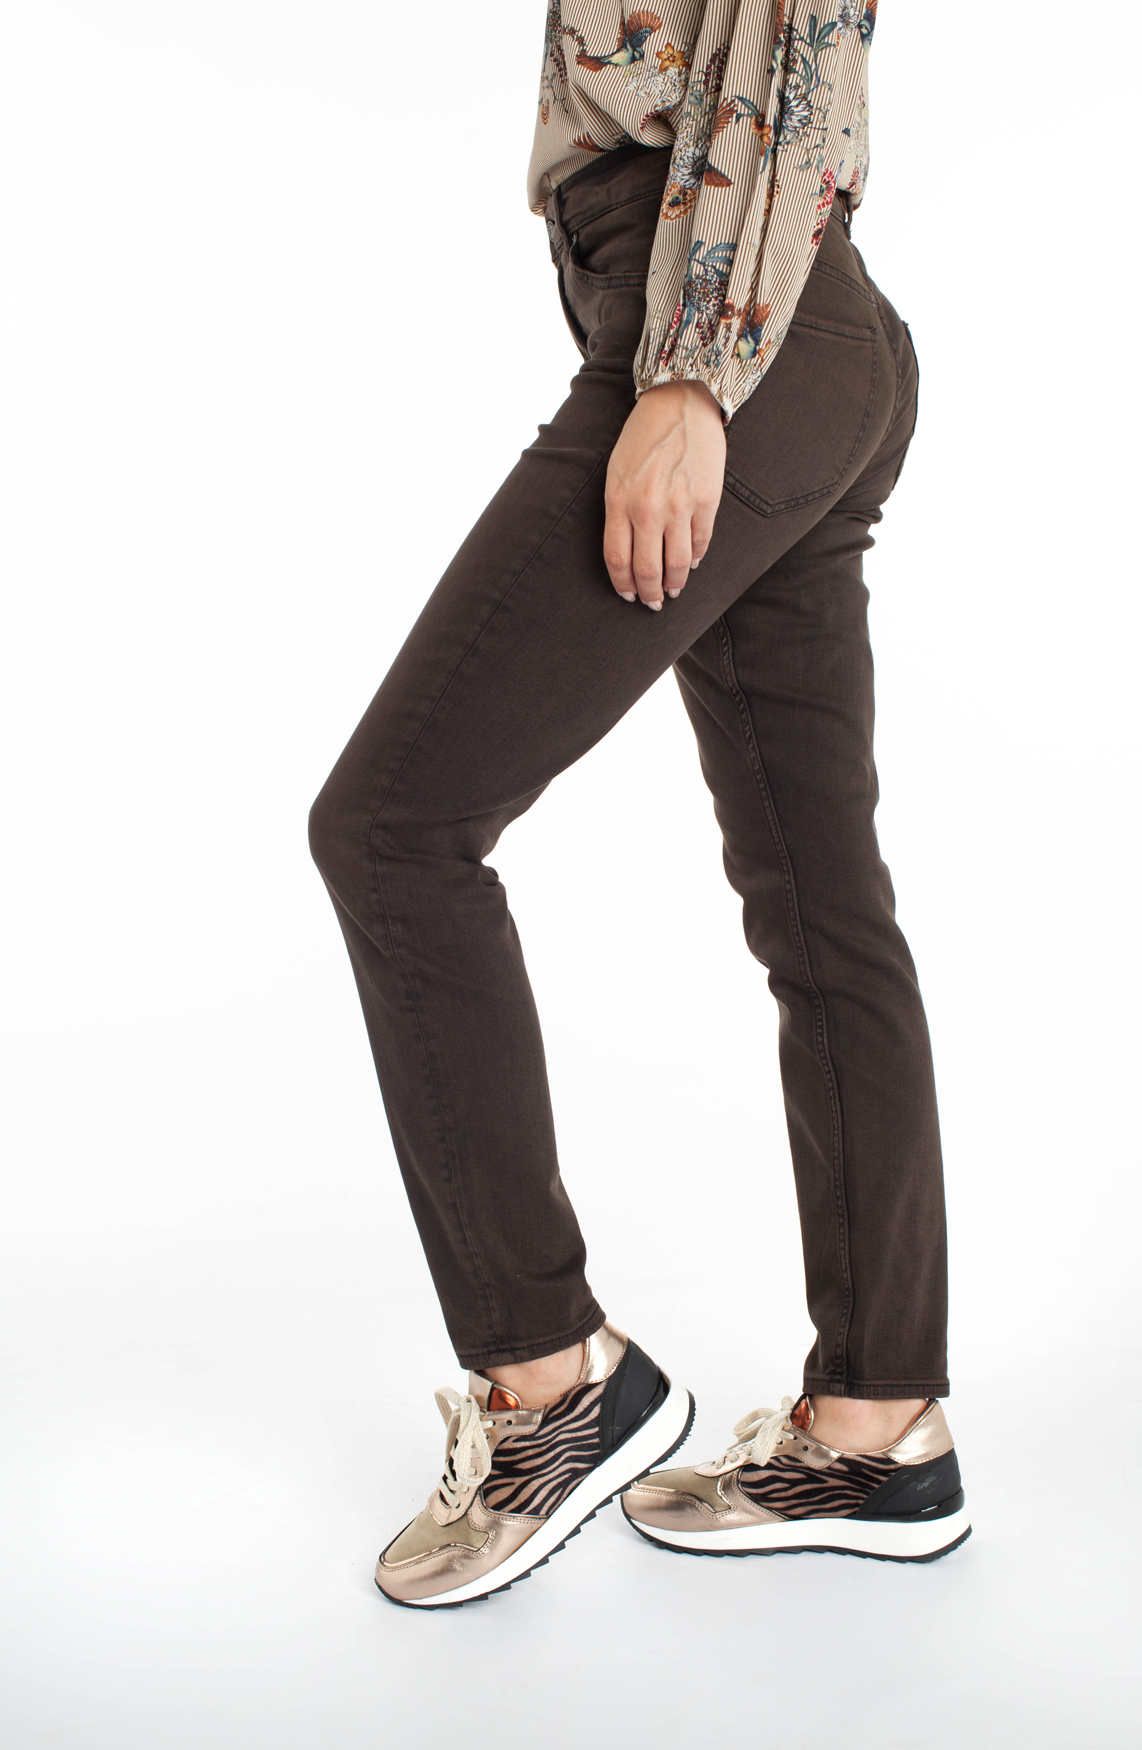 Rosner Dames Audrey bodyshaping jeans Bruin